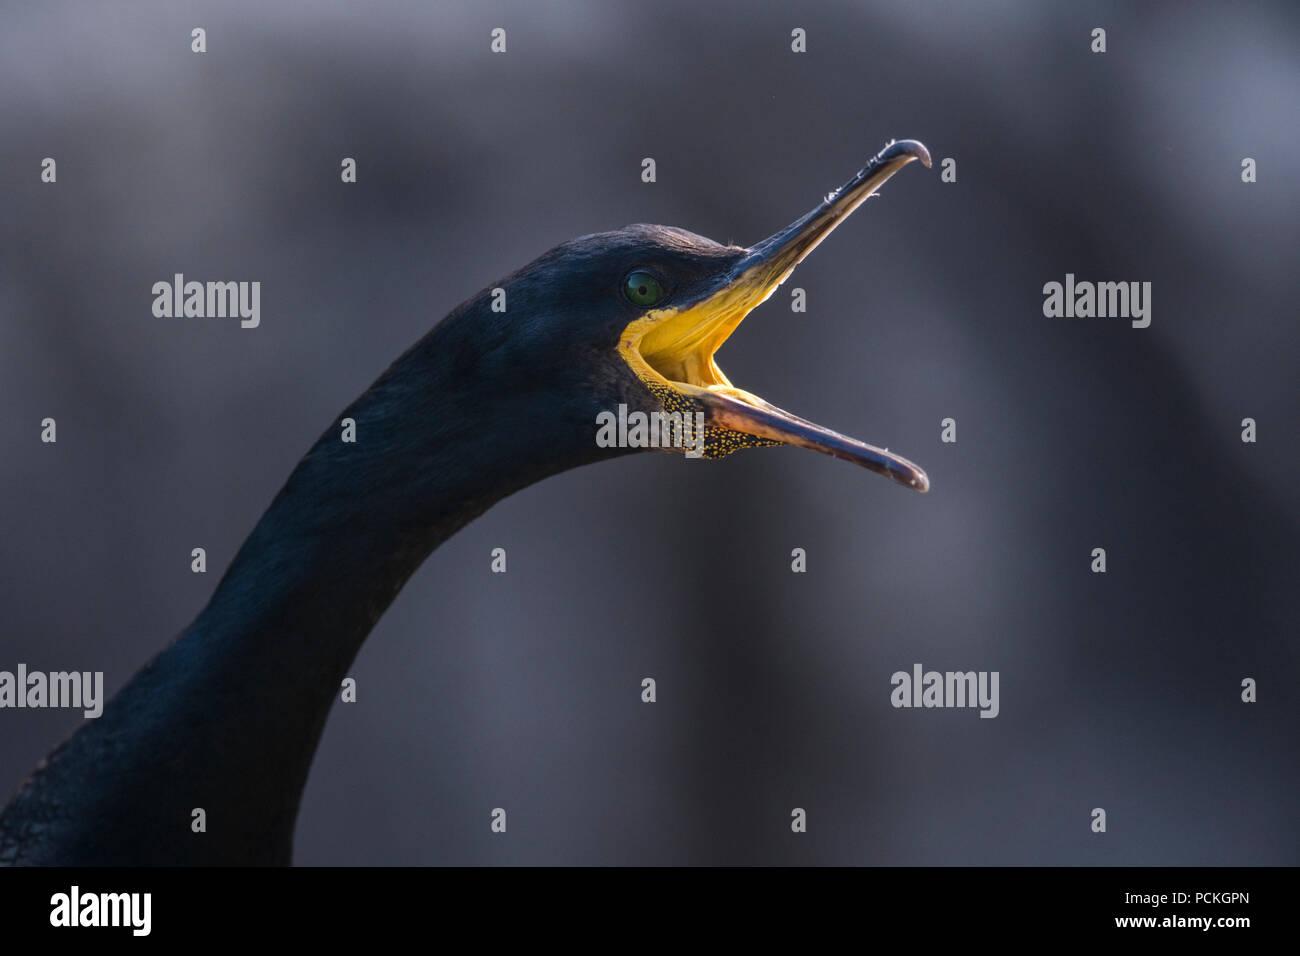 Close-up of an open mouthed European Shag (Phalacrocorax aristotelis), Lunga, Scotland - Stock Image